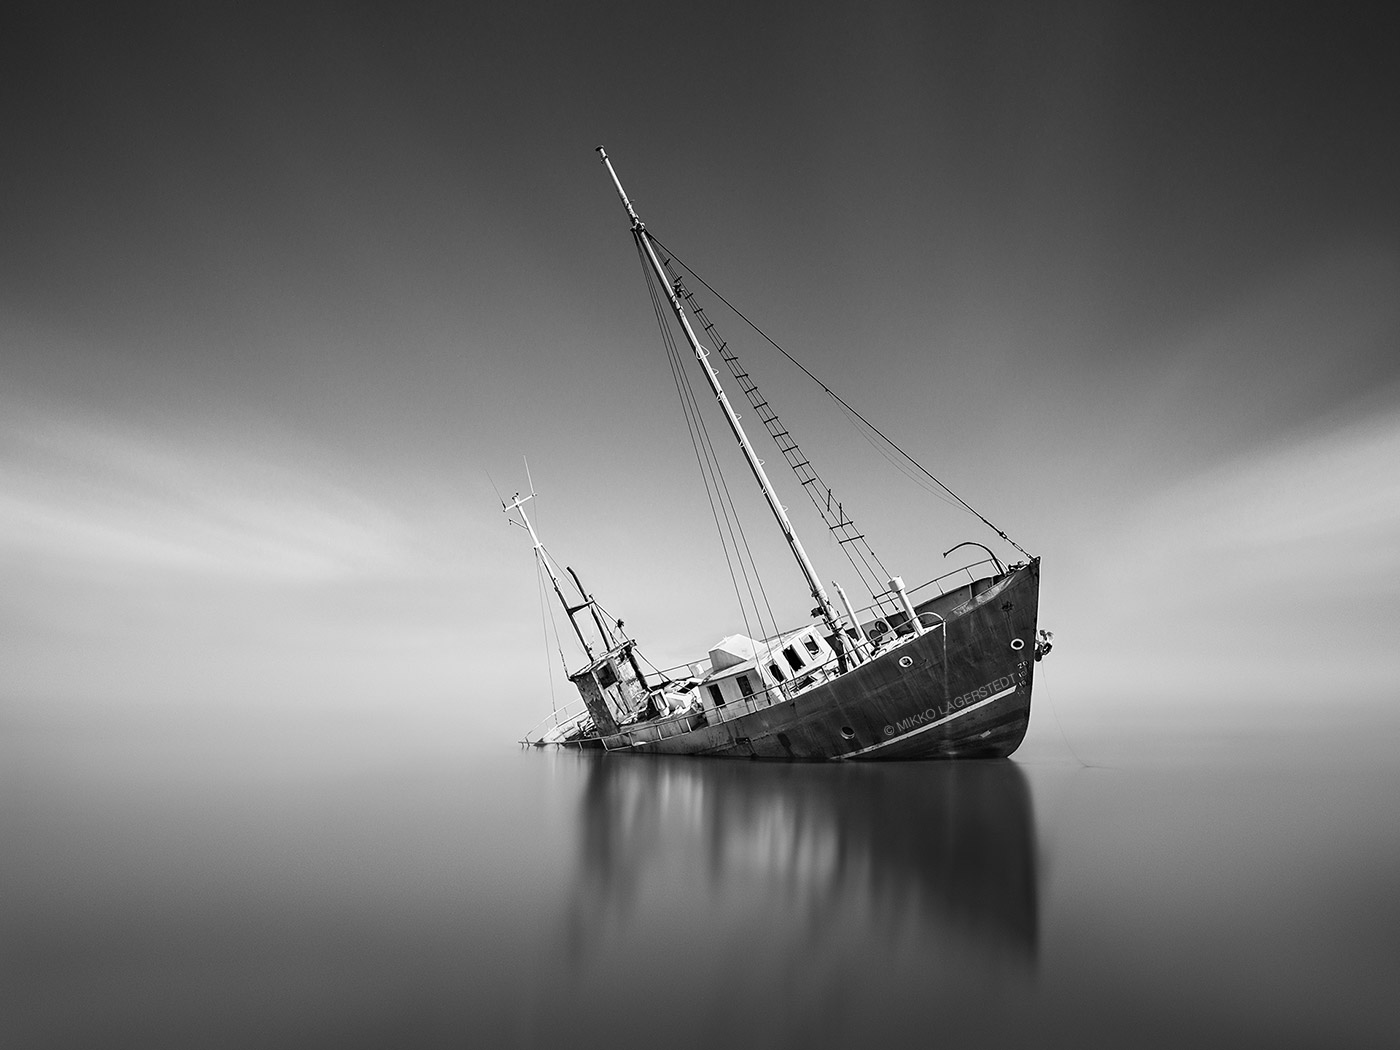 Shipwreck by MikkoLagerstedt